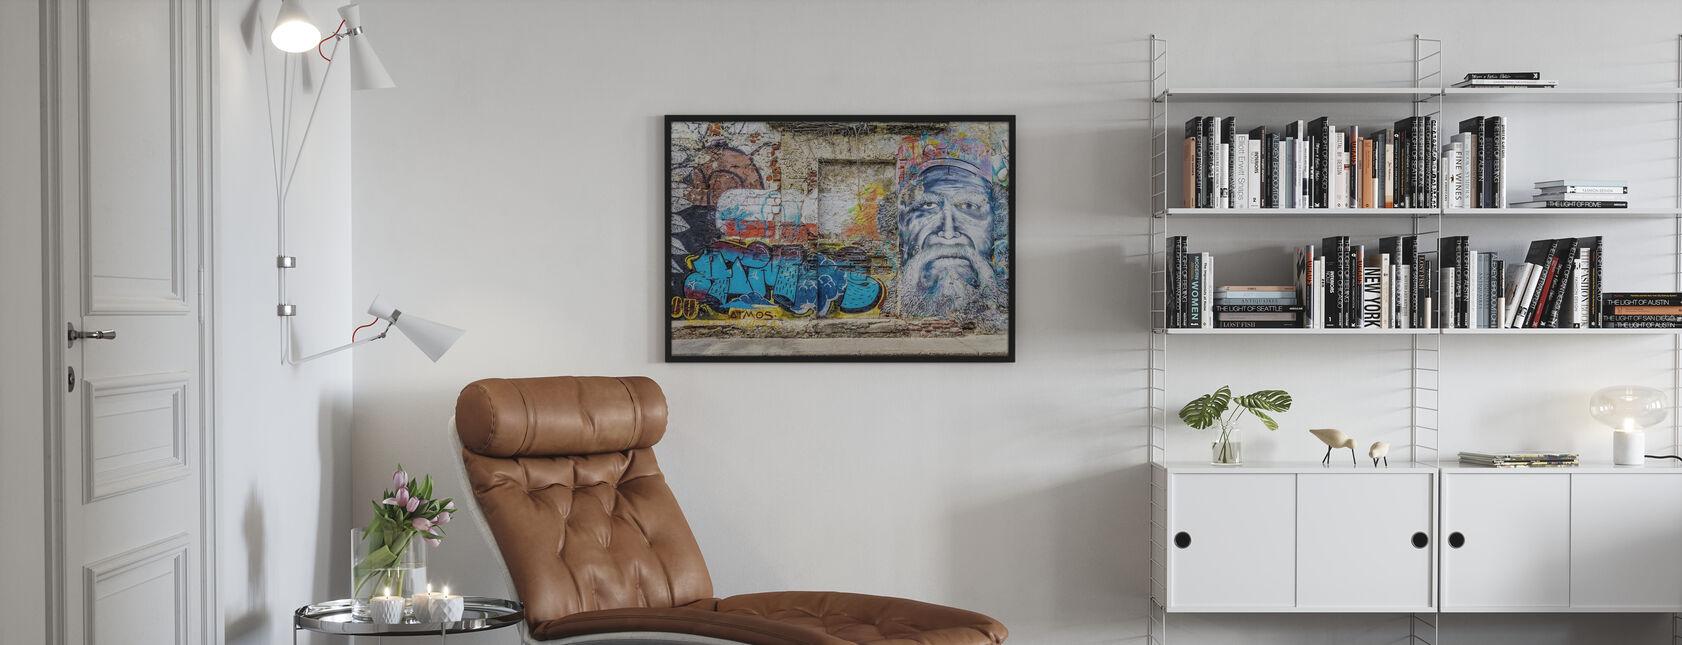 Wall Graffiti - Plakat - Stue